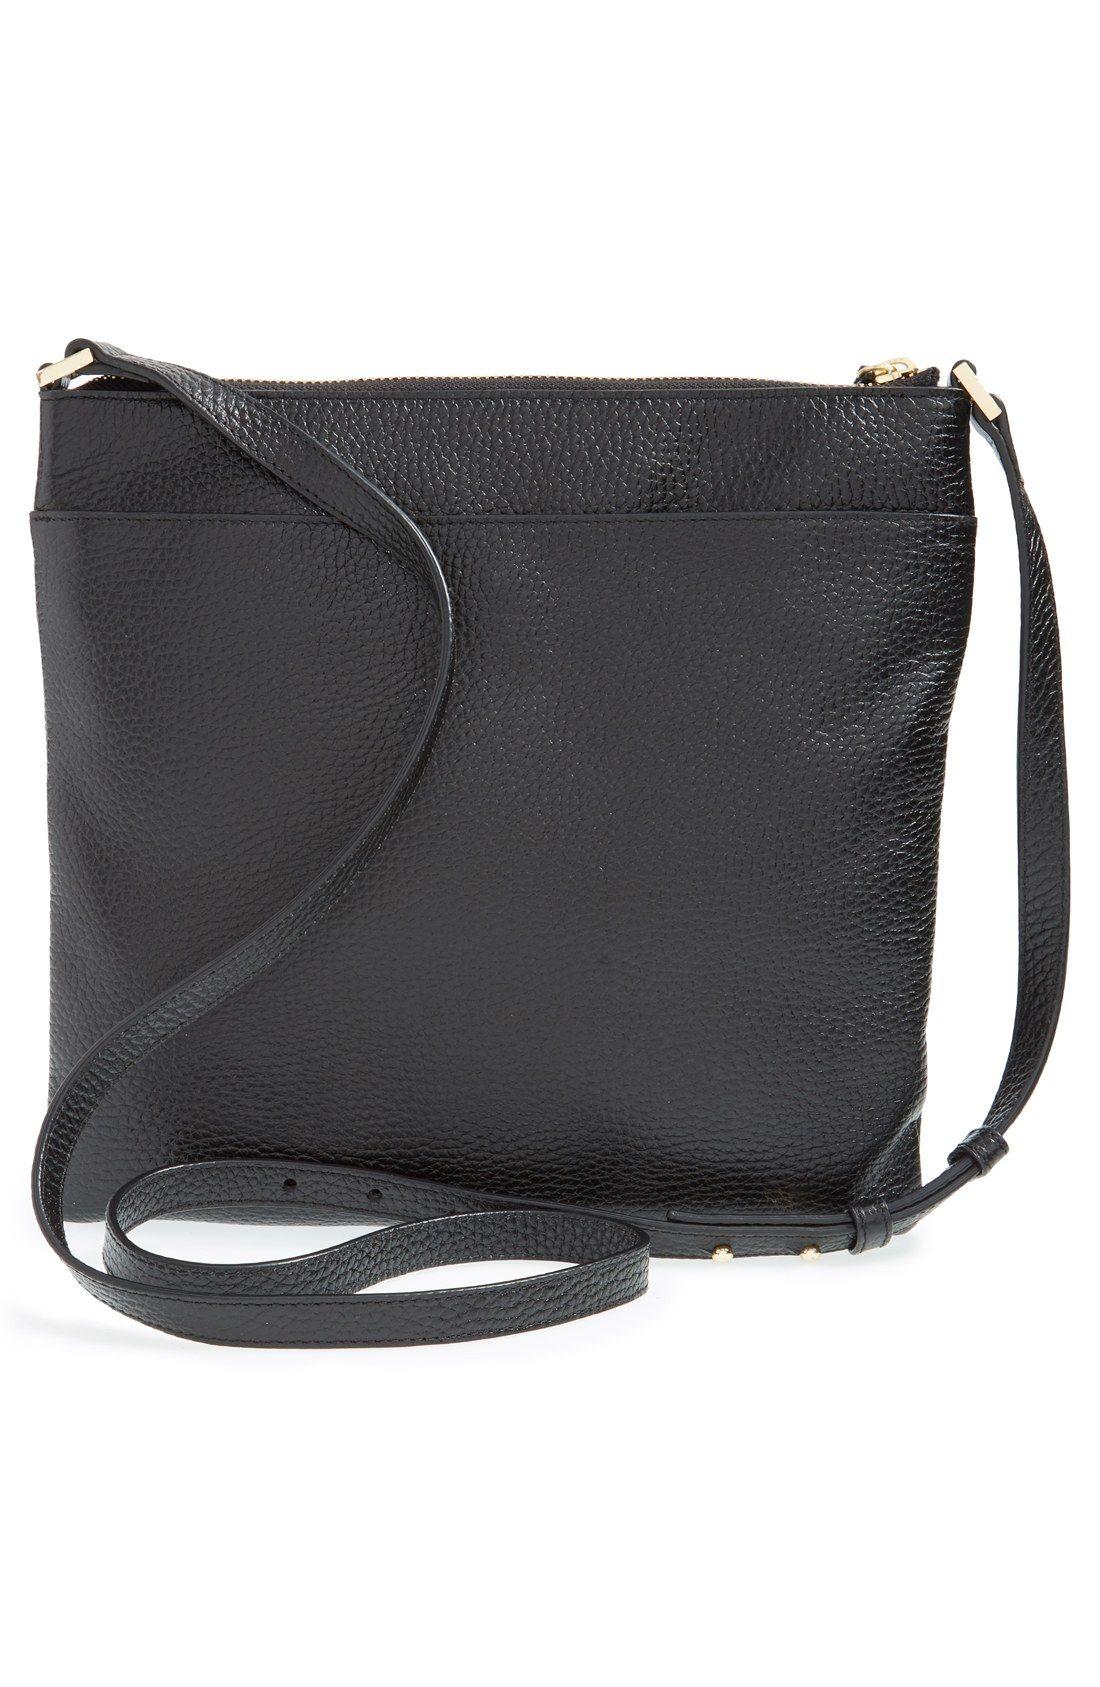 28521c61d86903 Halogen® Tasseled Leather Crossbody Bag | Wish List | Pinterest ...